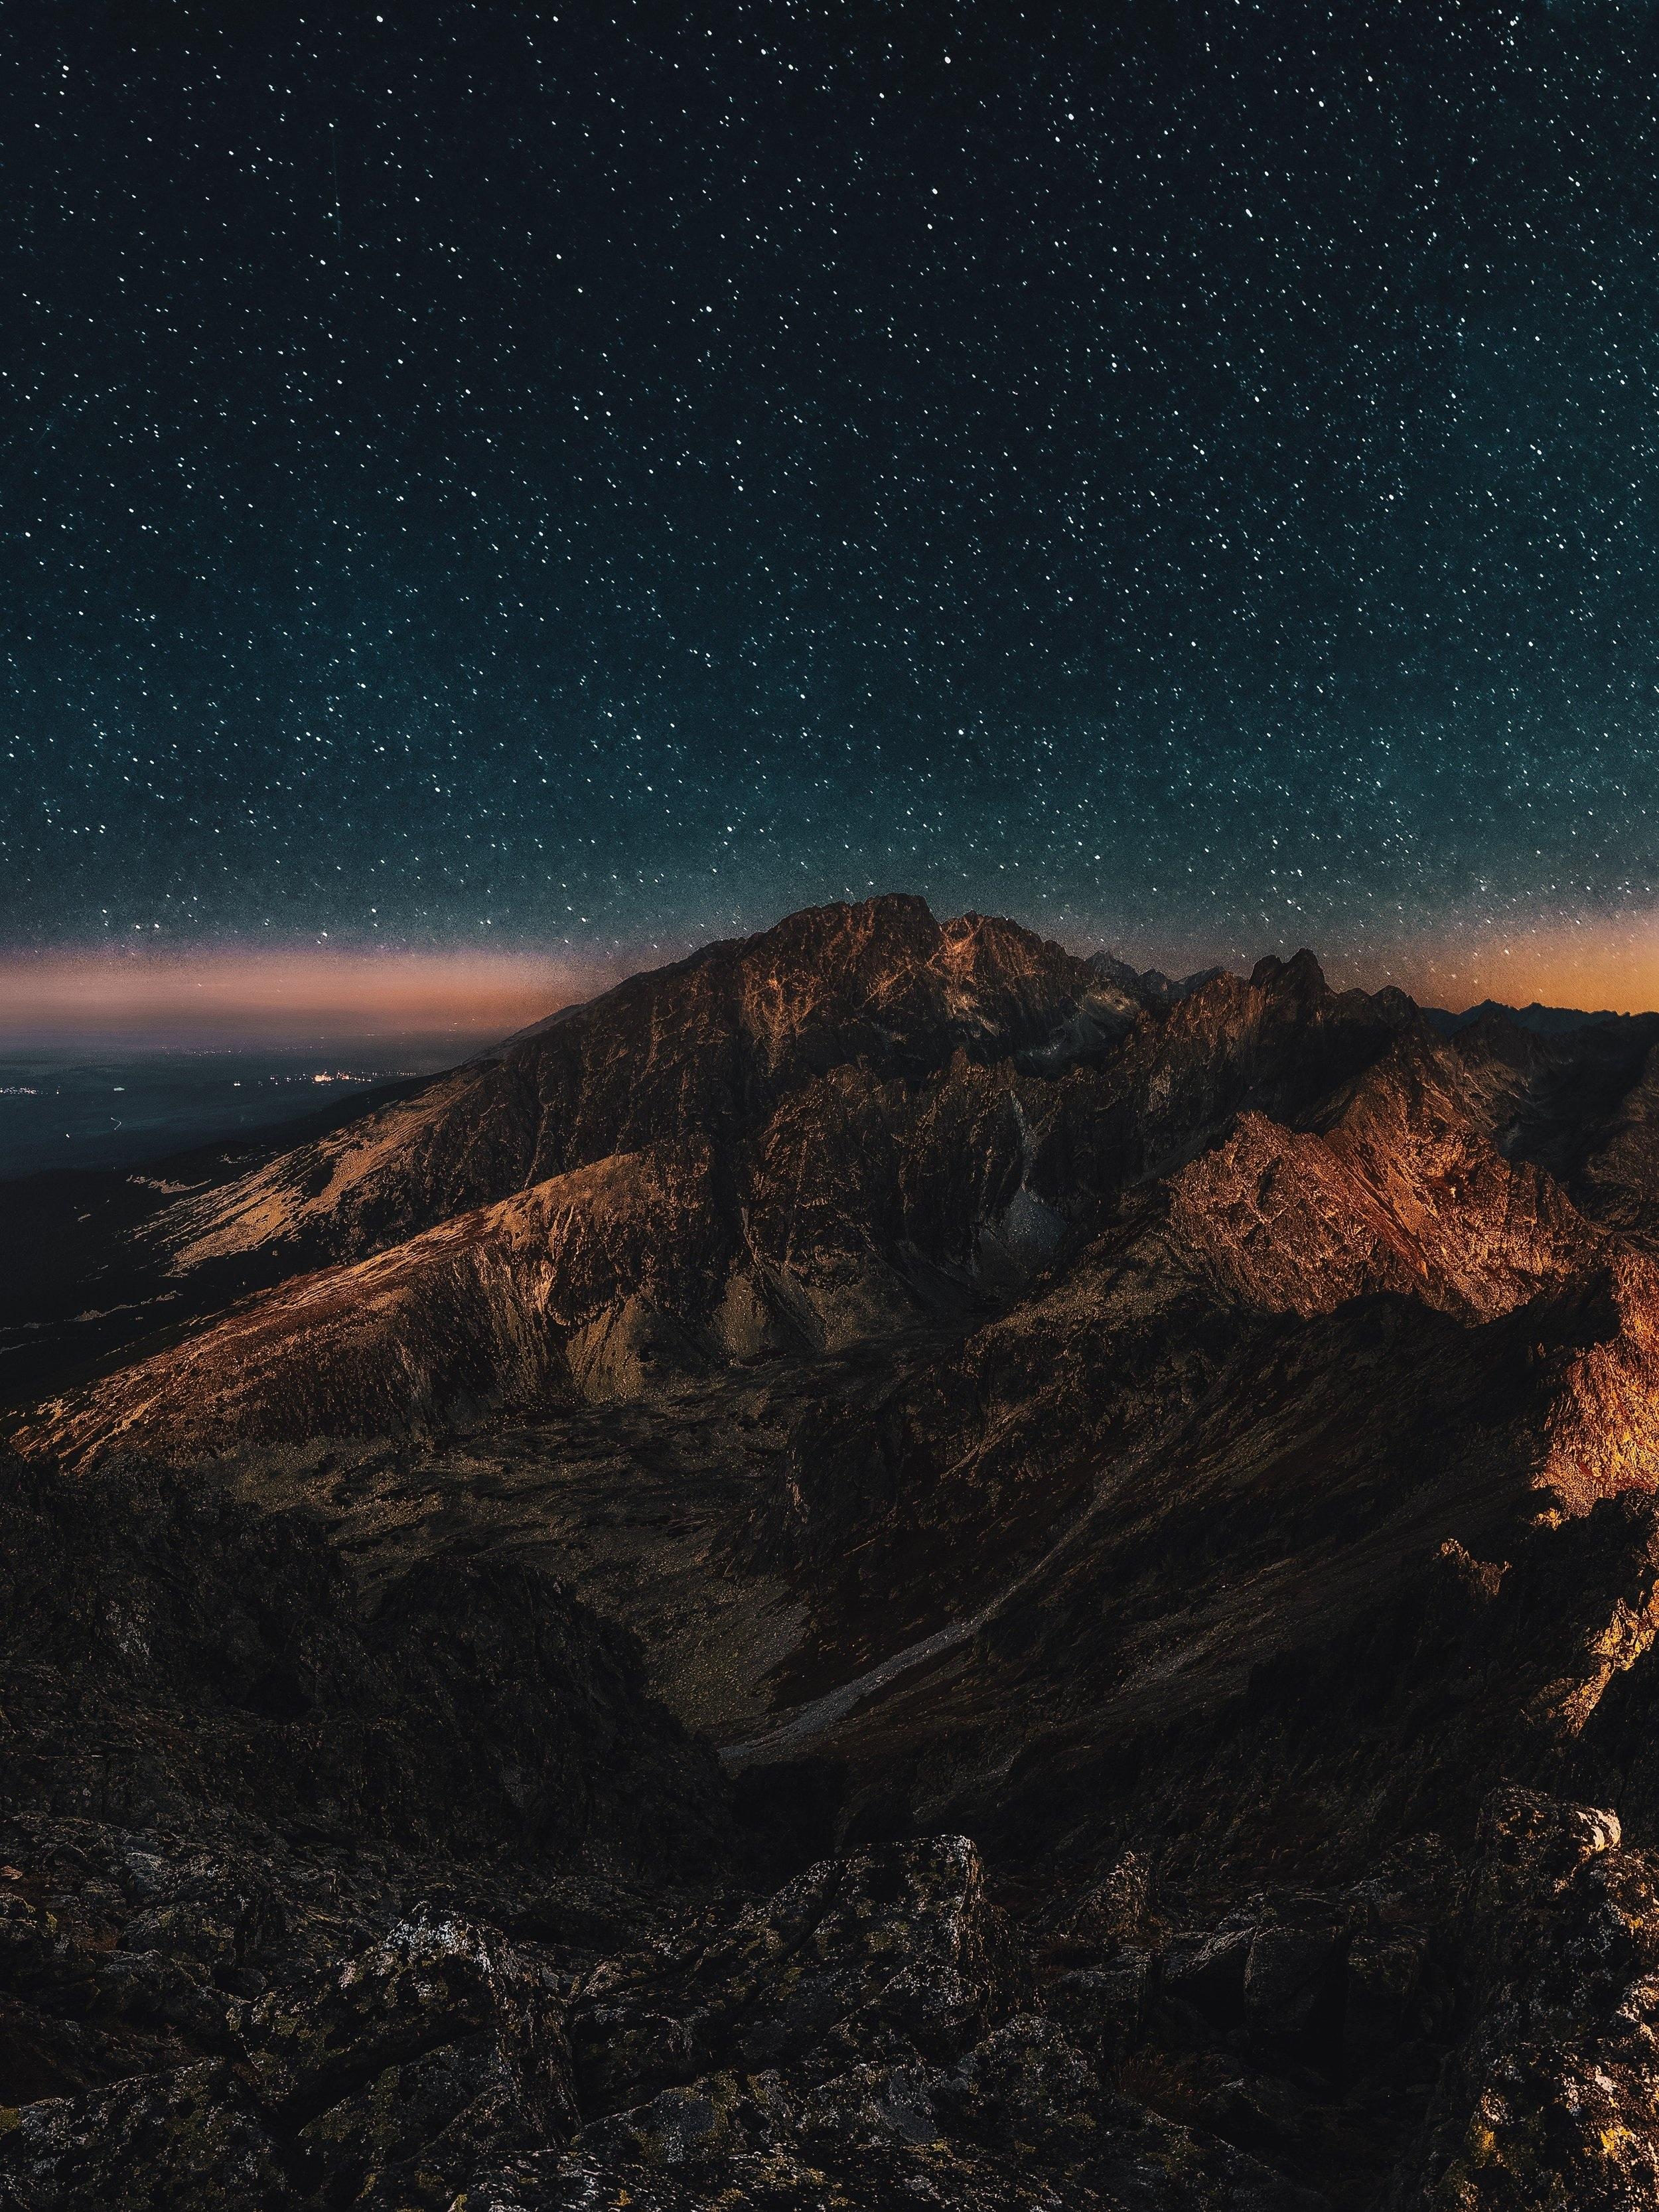 astronomy-dolomites-evening-1624496.jpg